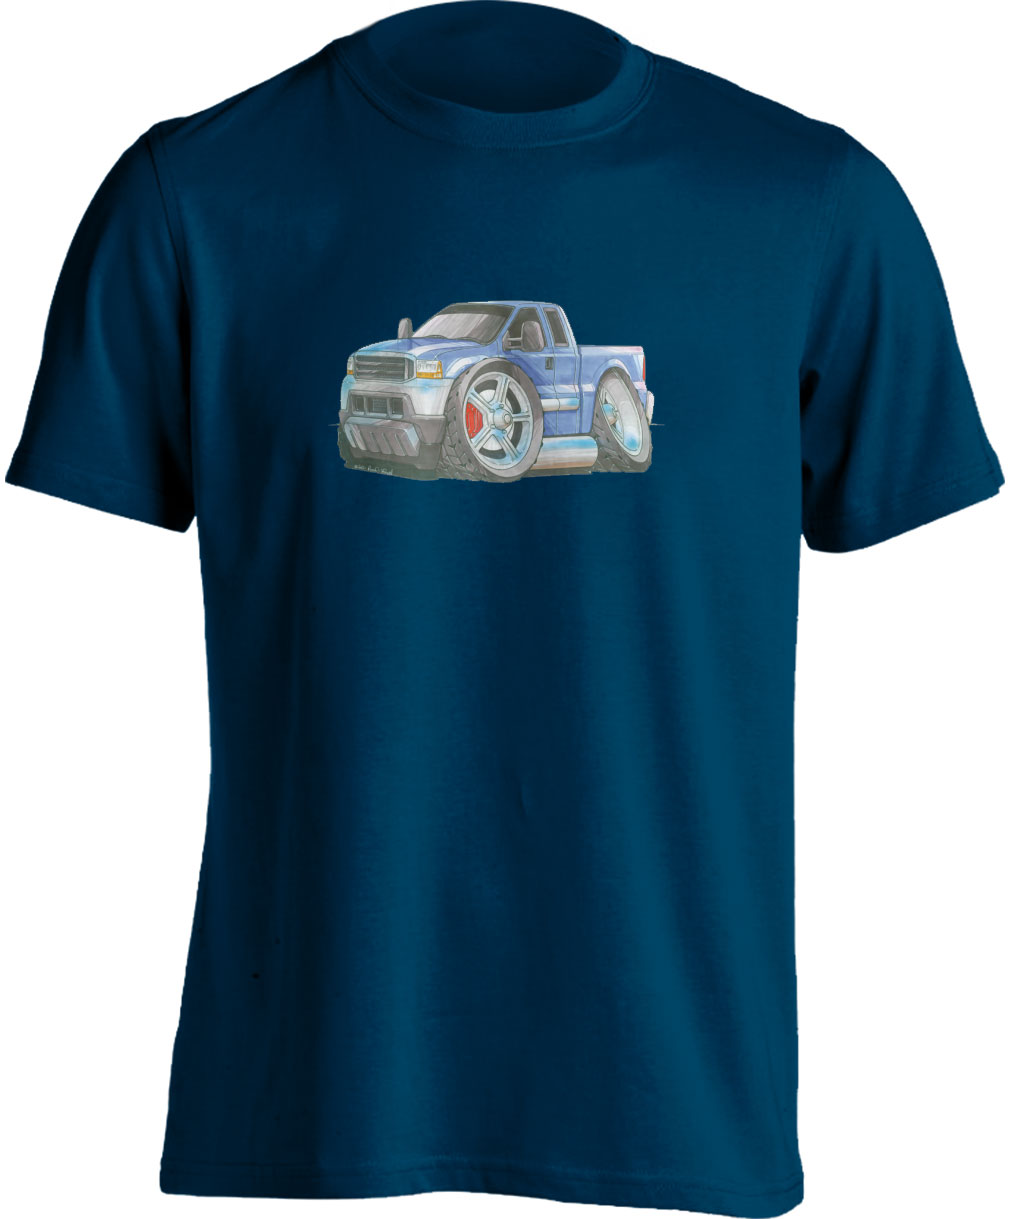 Koolart Excursion Pick Up Blue (1411)T Shirt